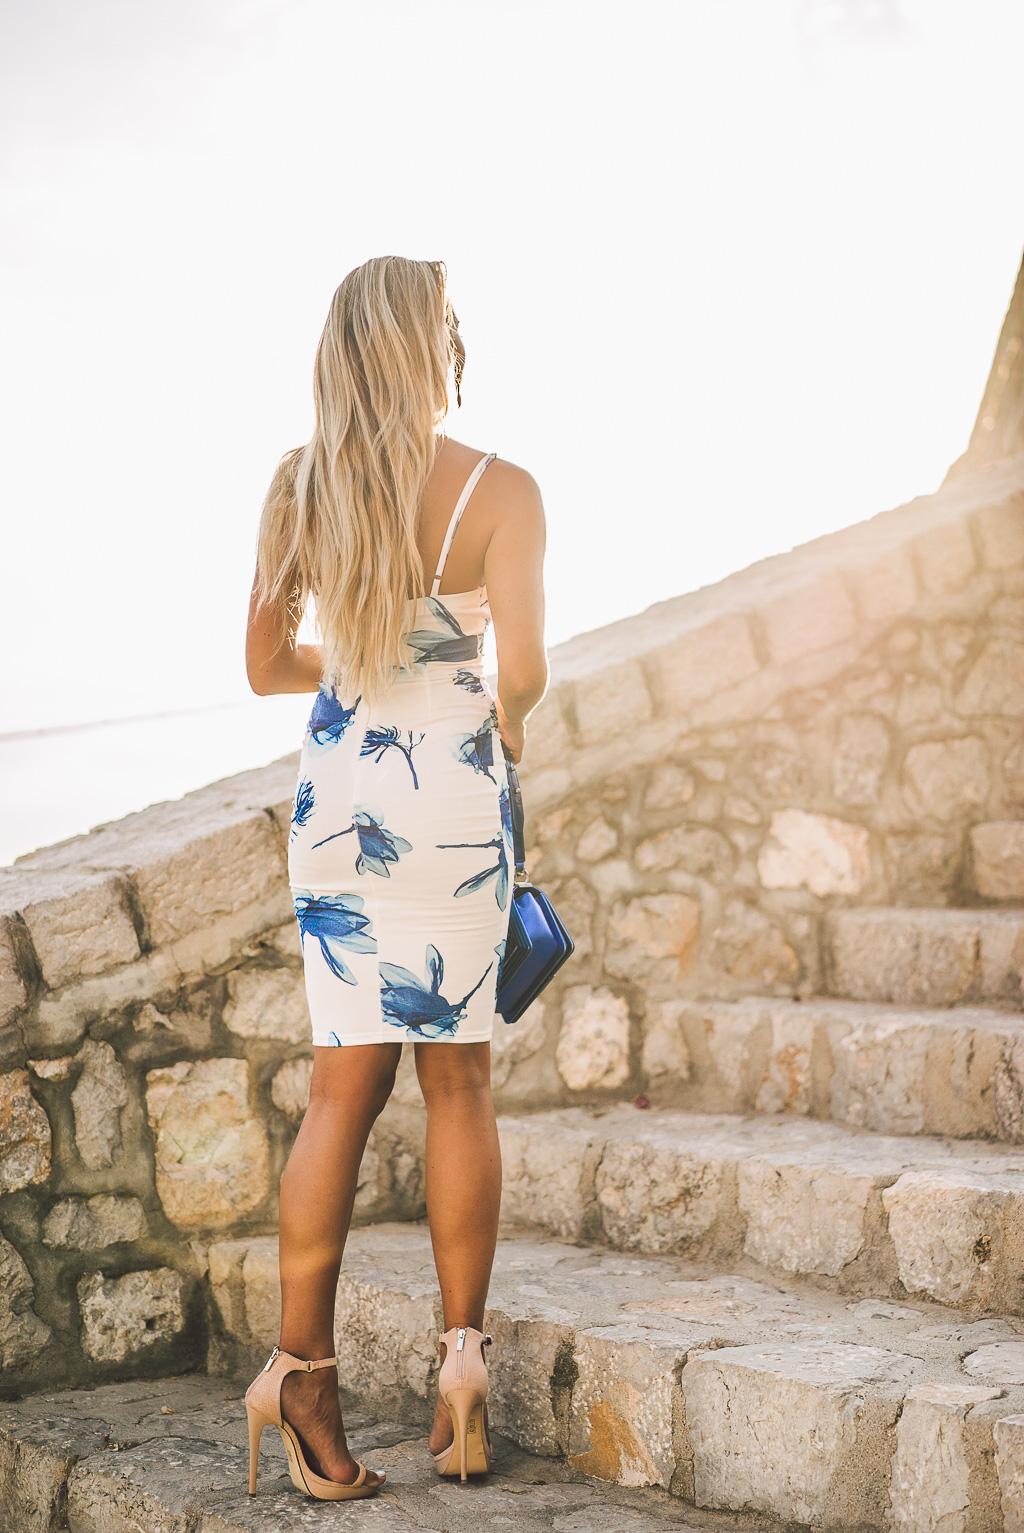 janni-deler-stair-greece-missholly-dressDSC07520